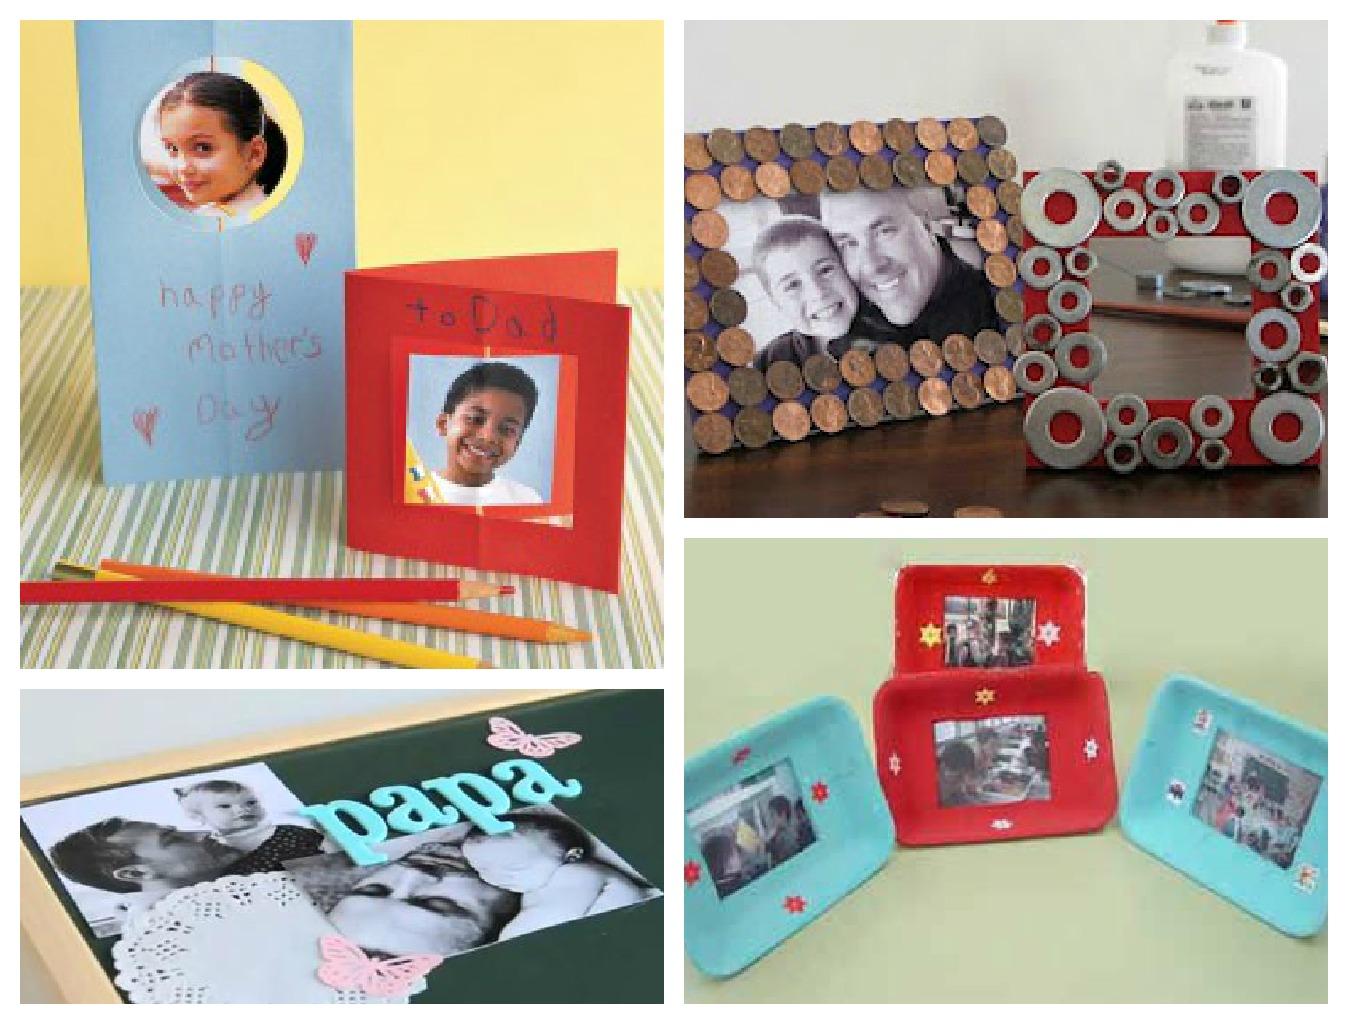 Lovers Crafts Ideas Para Regalar El Dia Del Padre - Ideas-regalo-padres